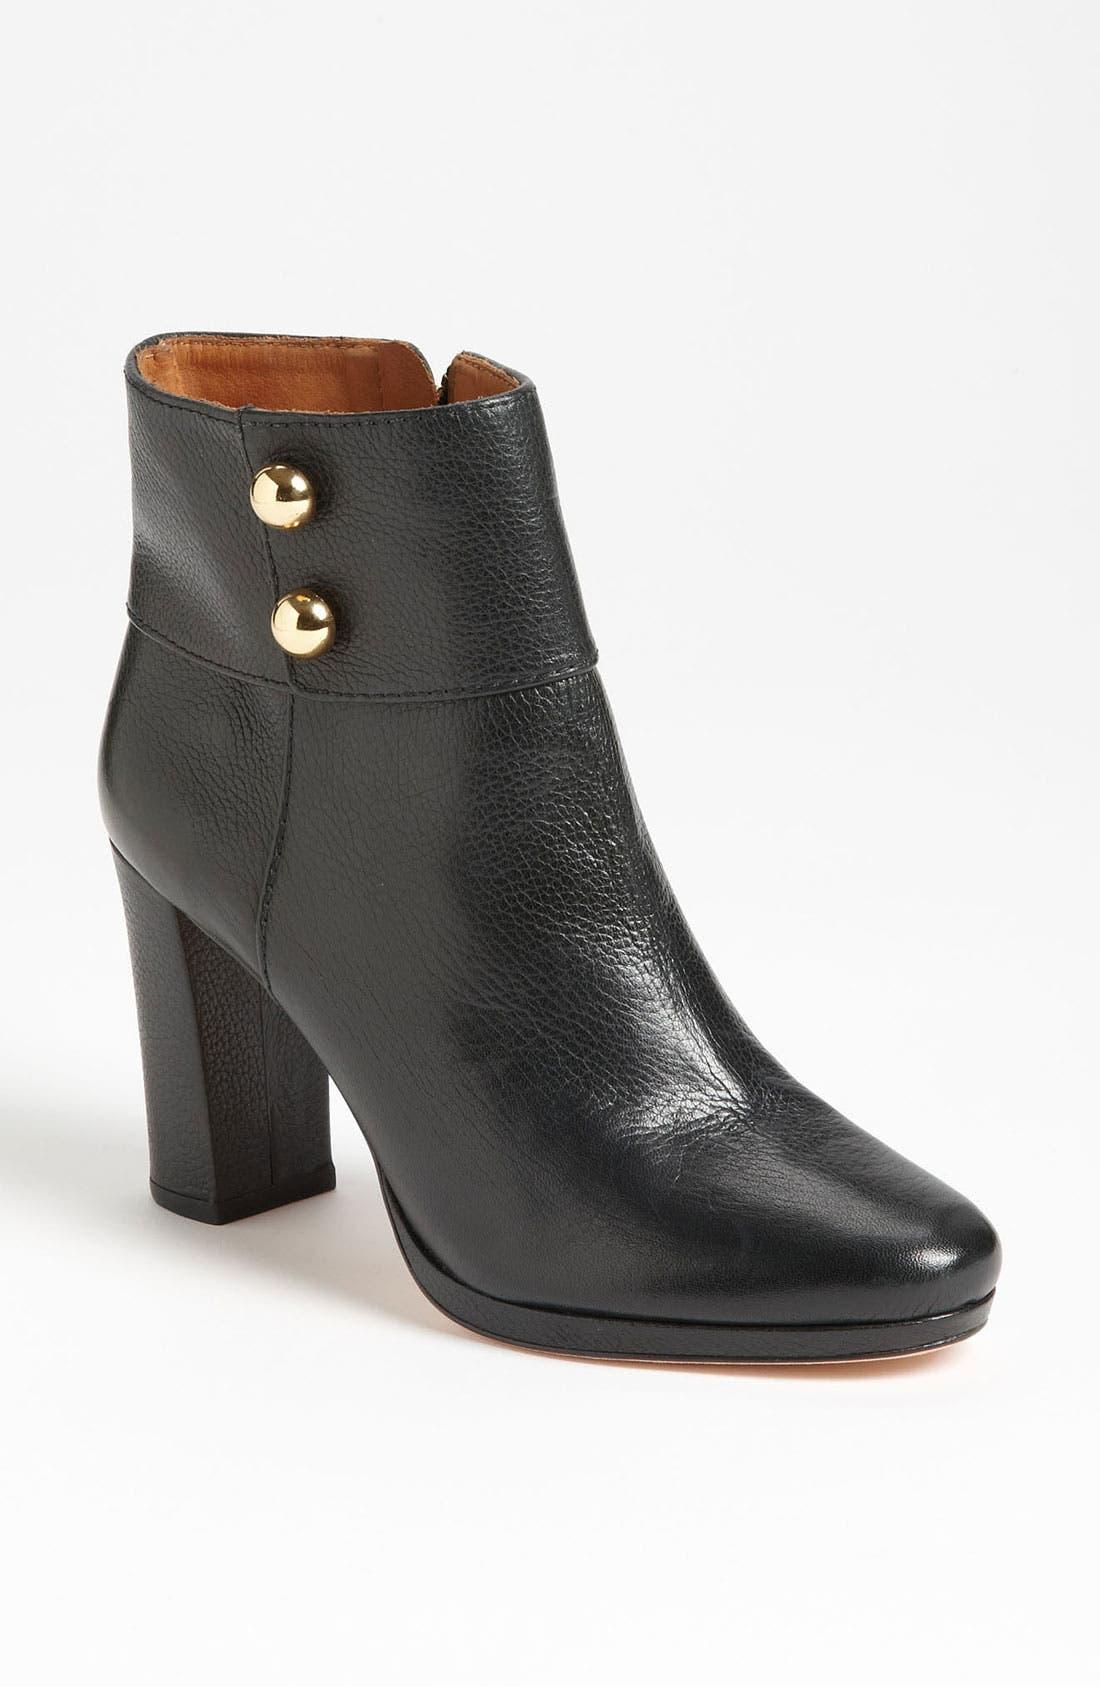 Main Image - kate spade new york 'bridgette' boot